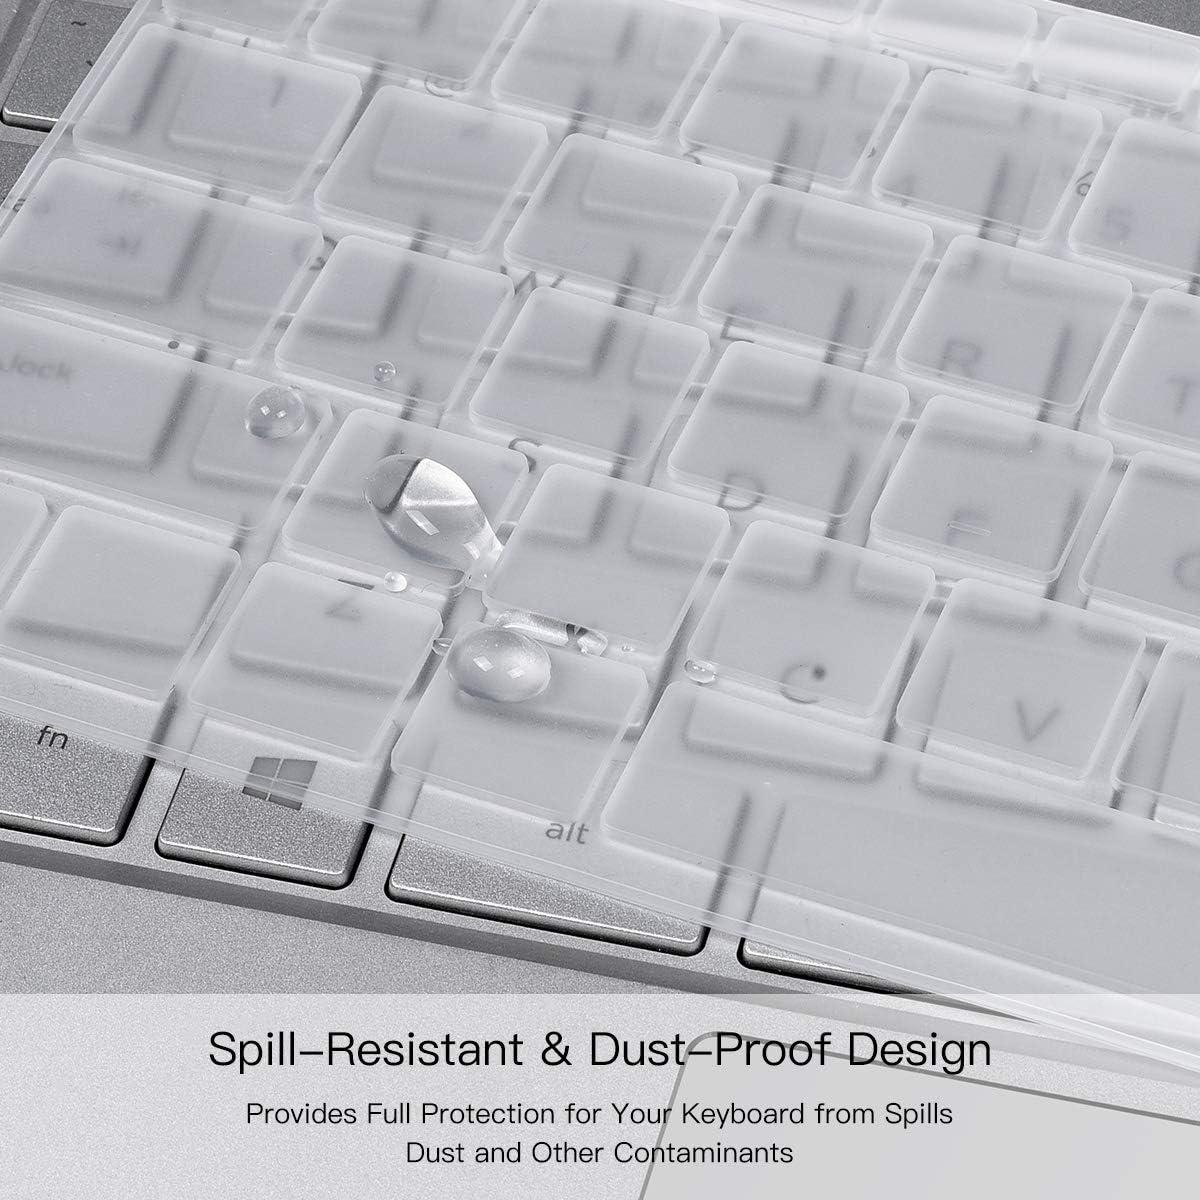 Clear HP EliteBook 755 G5 Keyboard Cover Silicone Keyboard Cover for HP EliteBook 850 G5//HP Zbook 15 G5//HP EliteBook 755 G5//HP ZBook 15u G5//HP Zbook 15v G5 15.6 Keyboard Skin